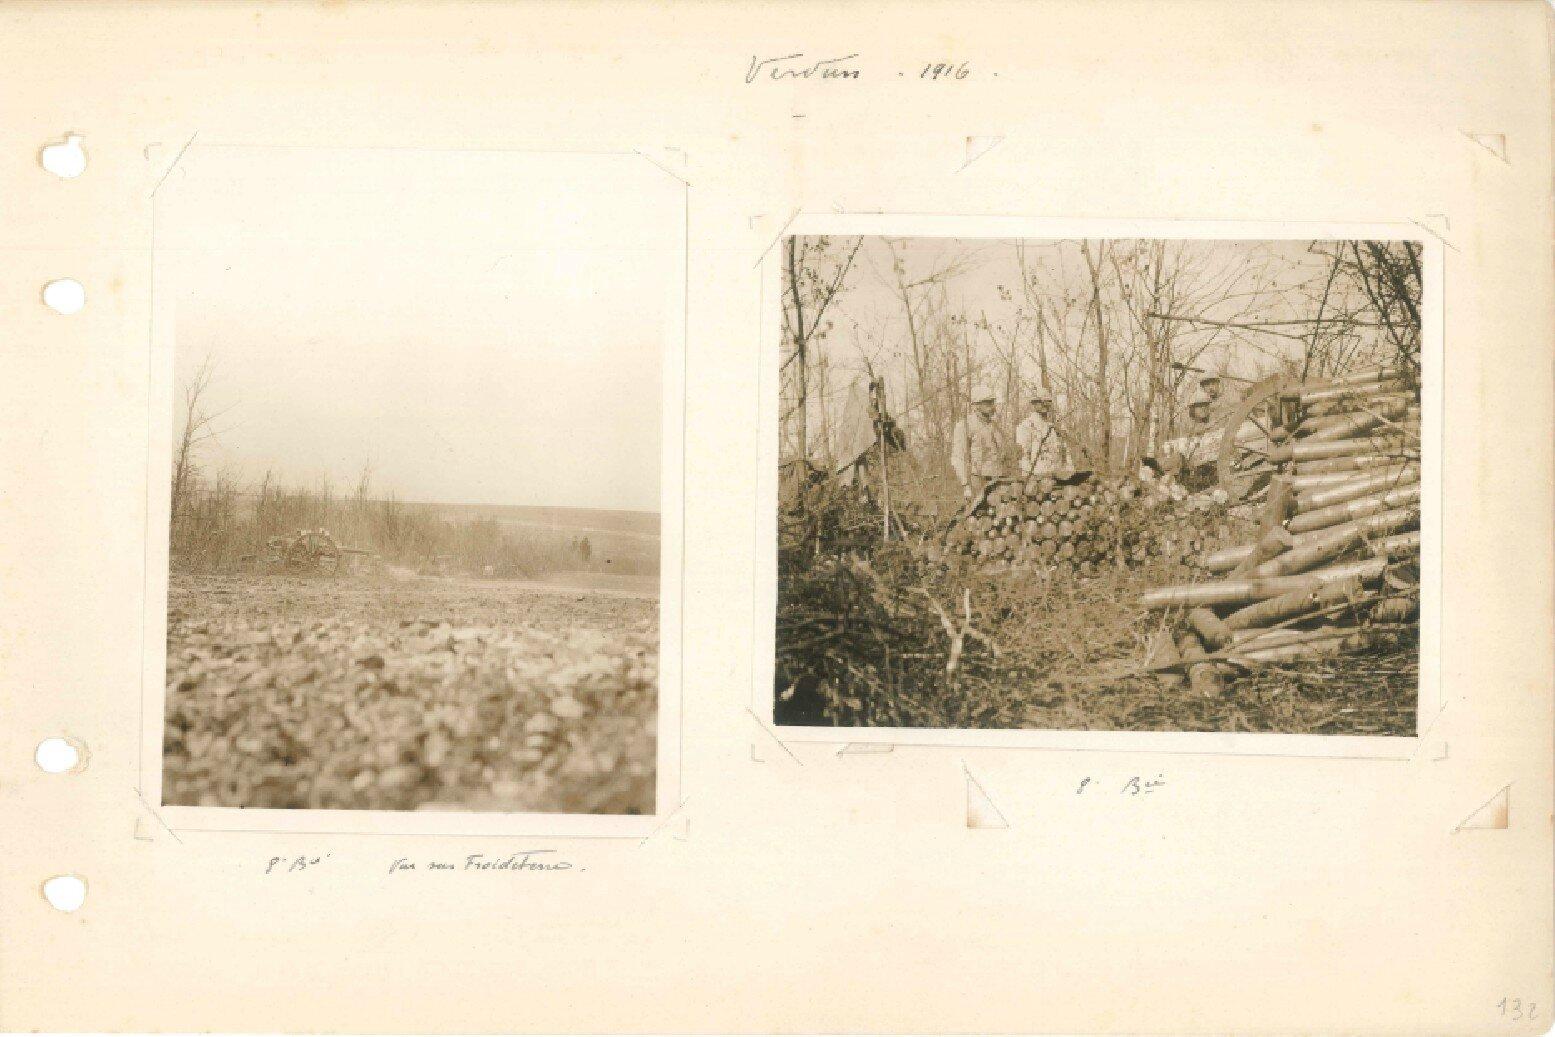 p.132 - Verdun (29 mars – 20 juin 1916)